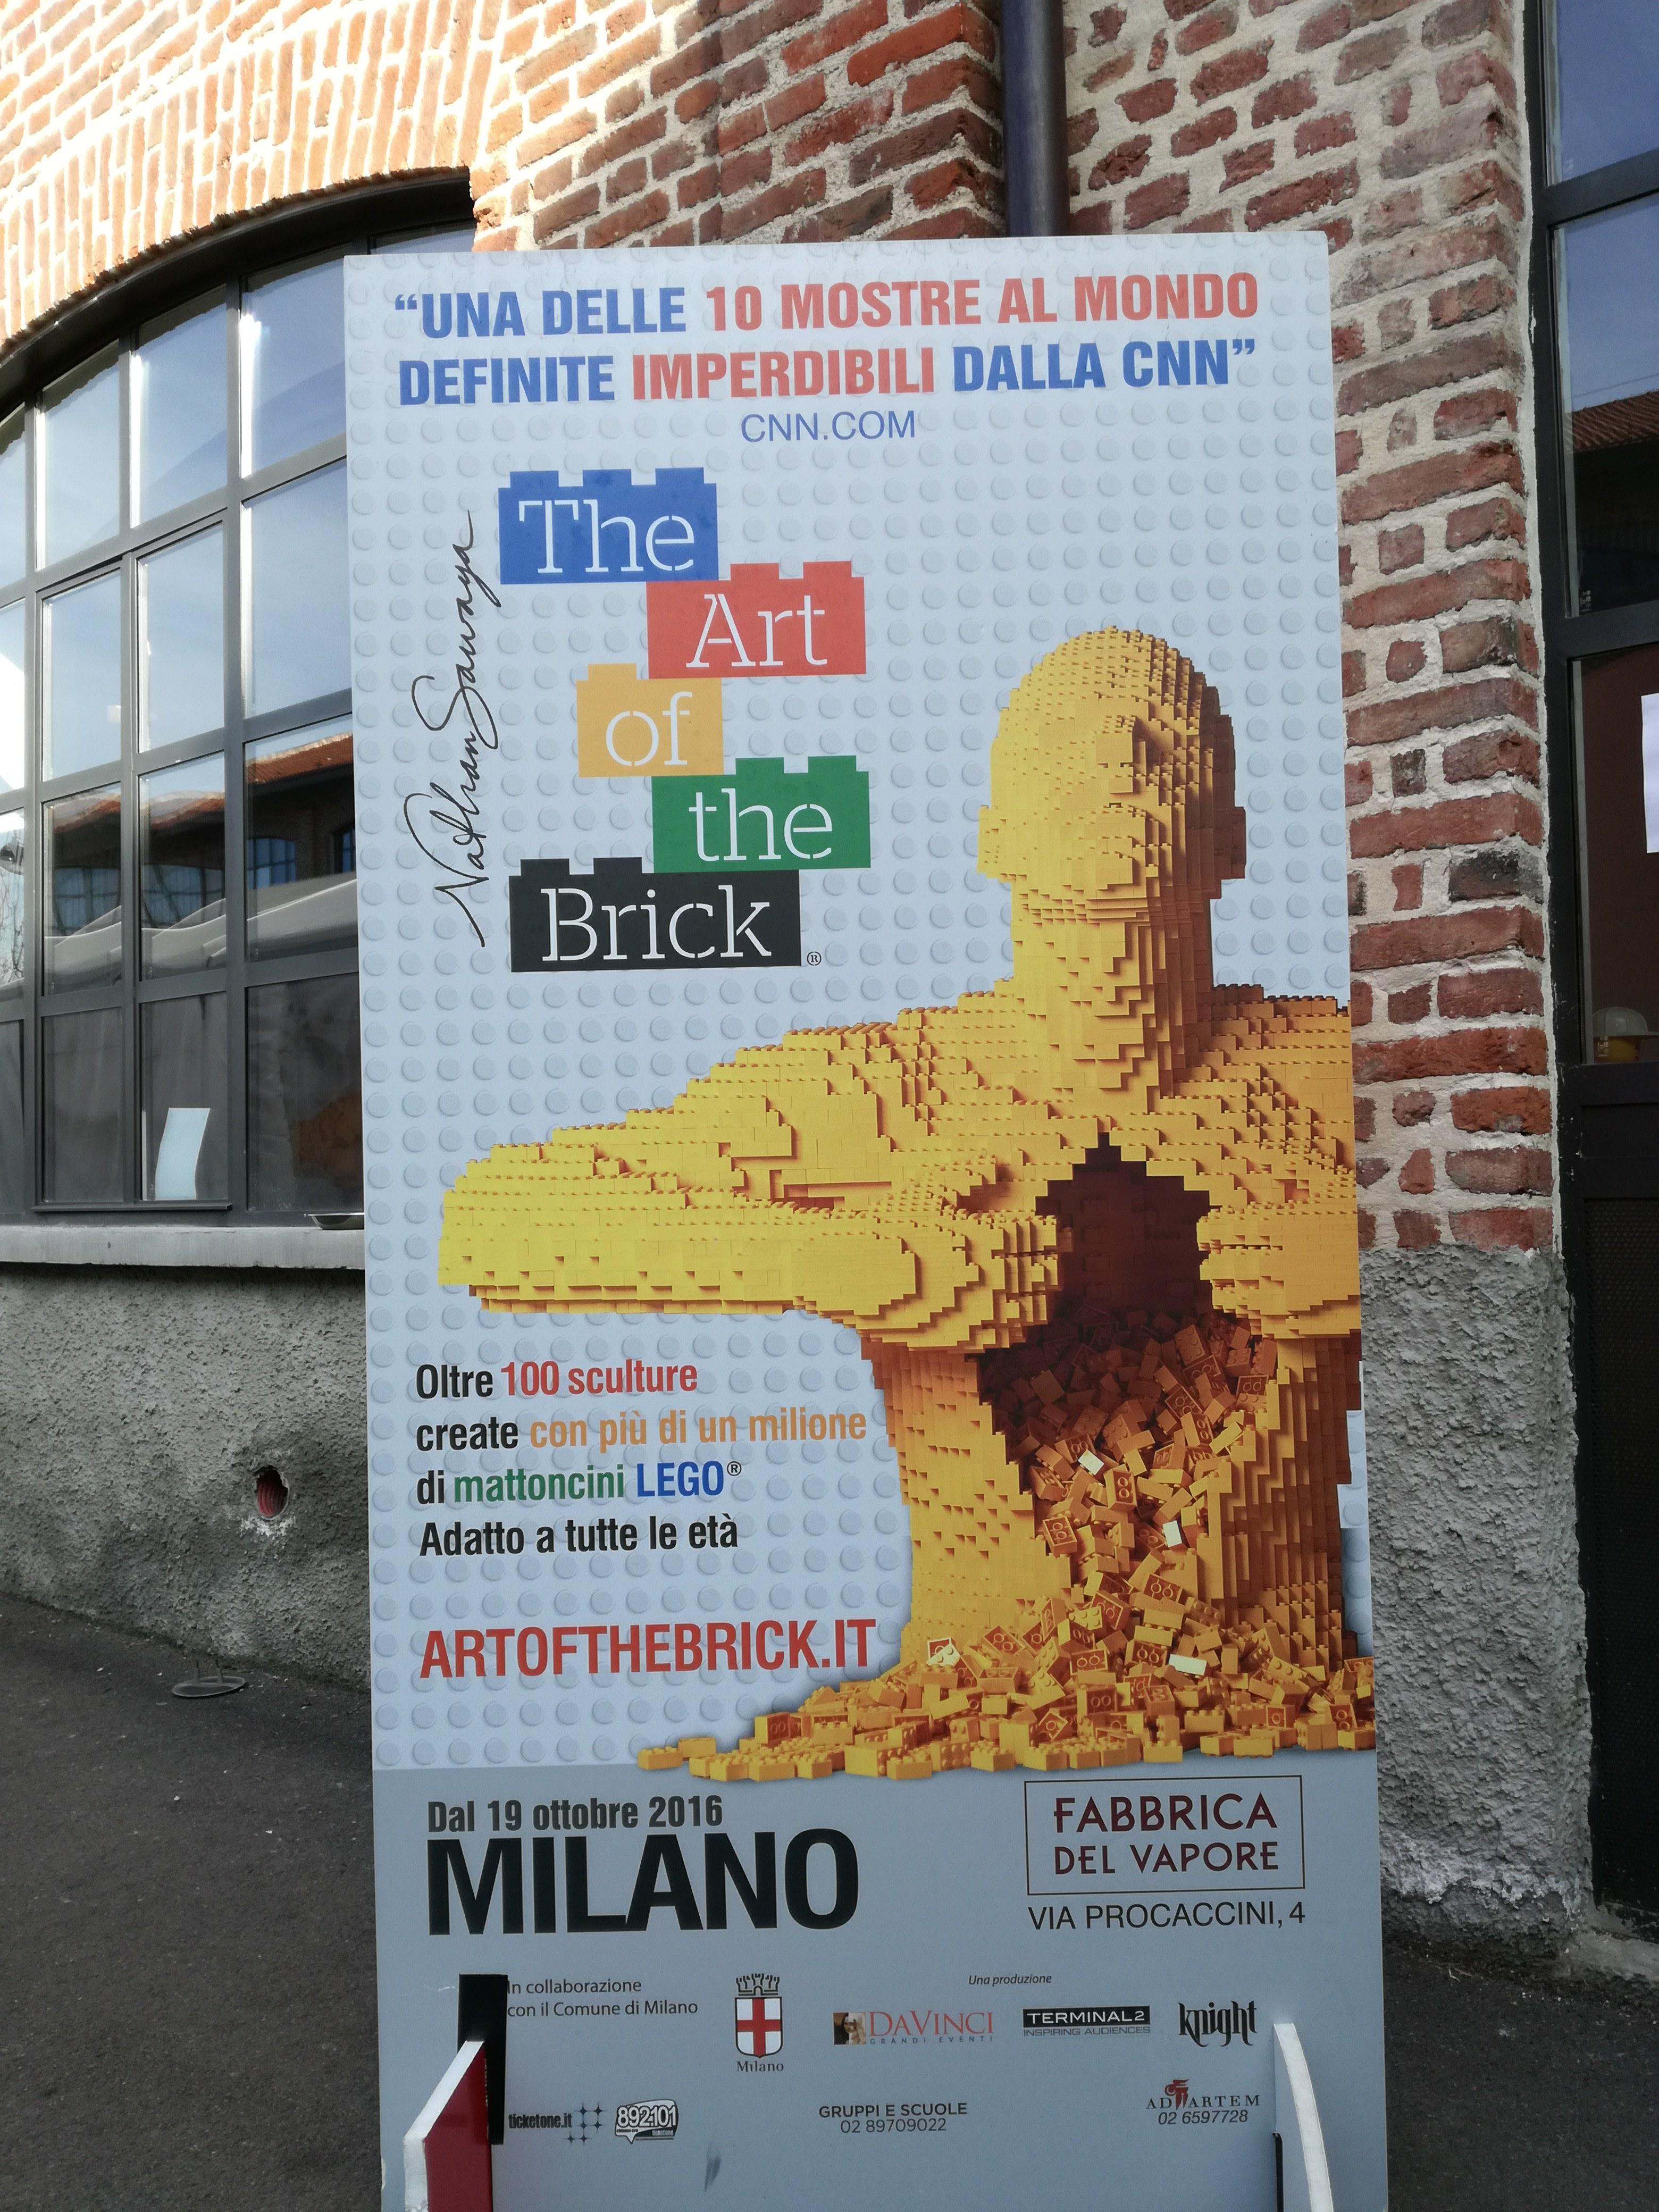 Art of the brick